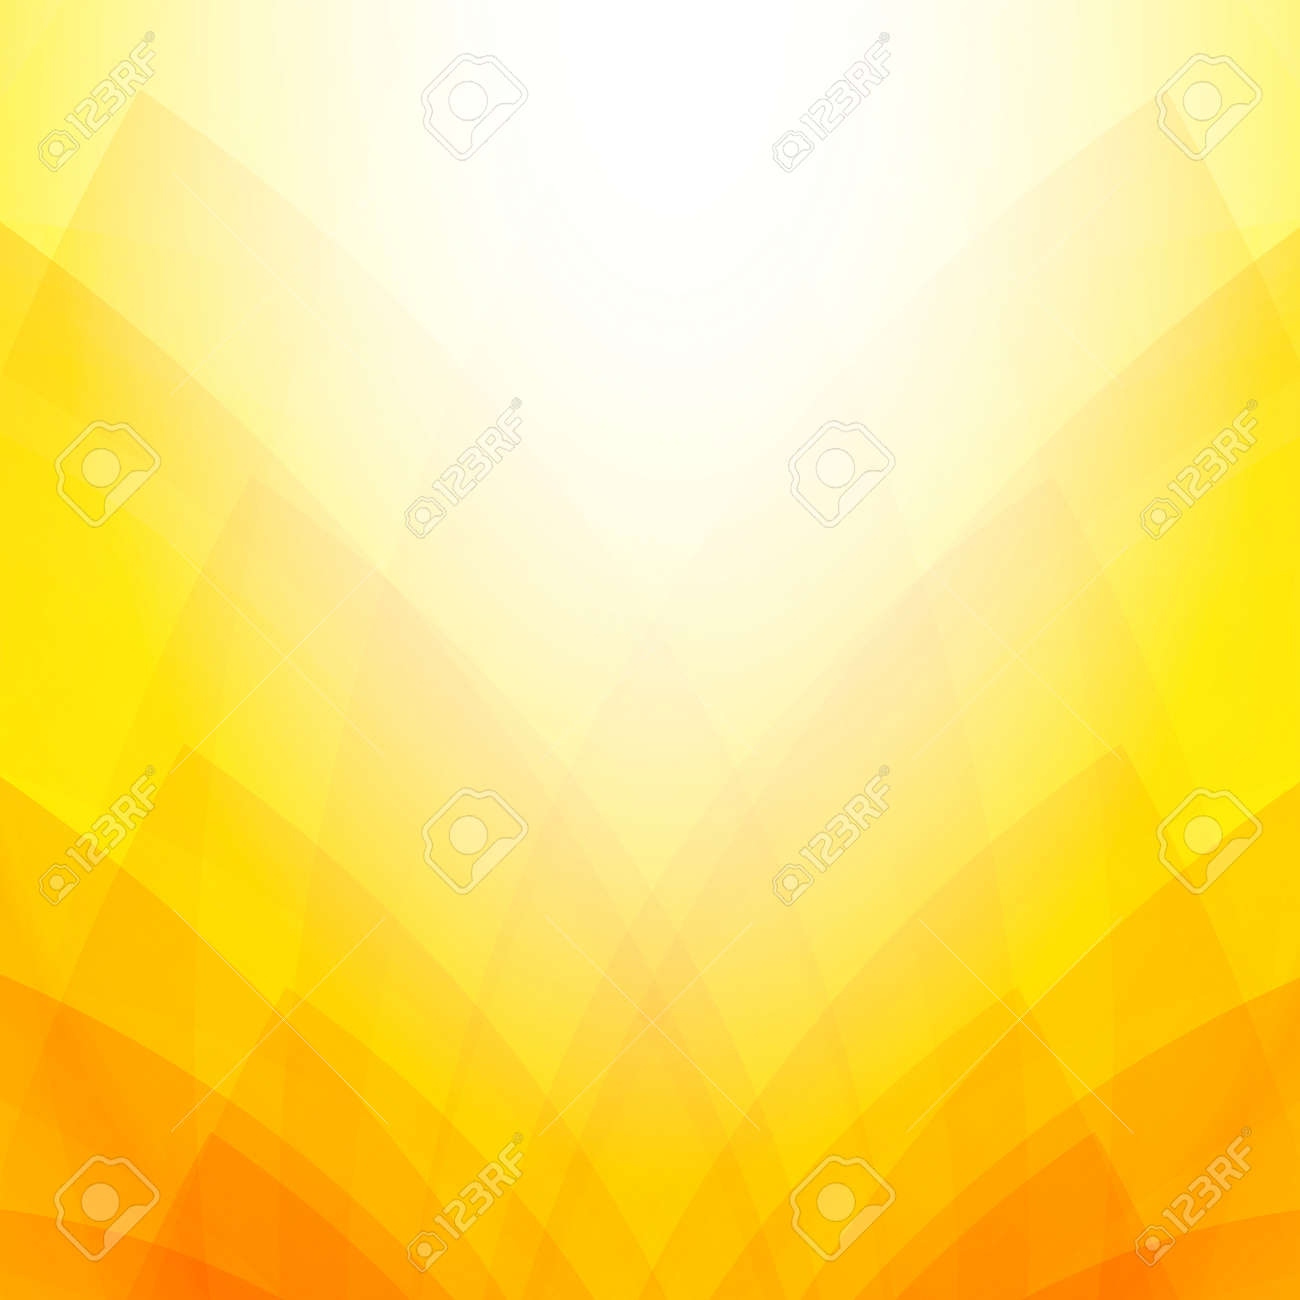 Abstract Soft Tones Background Orange Yellow Background